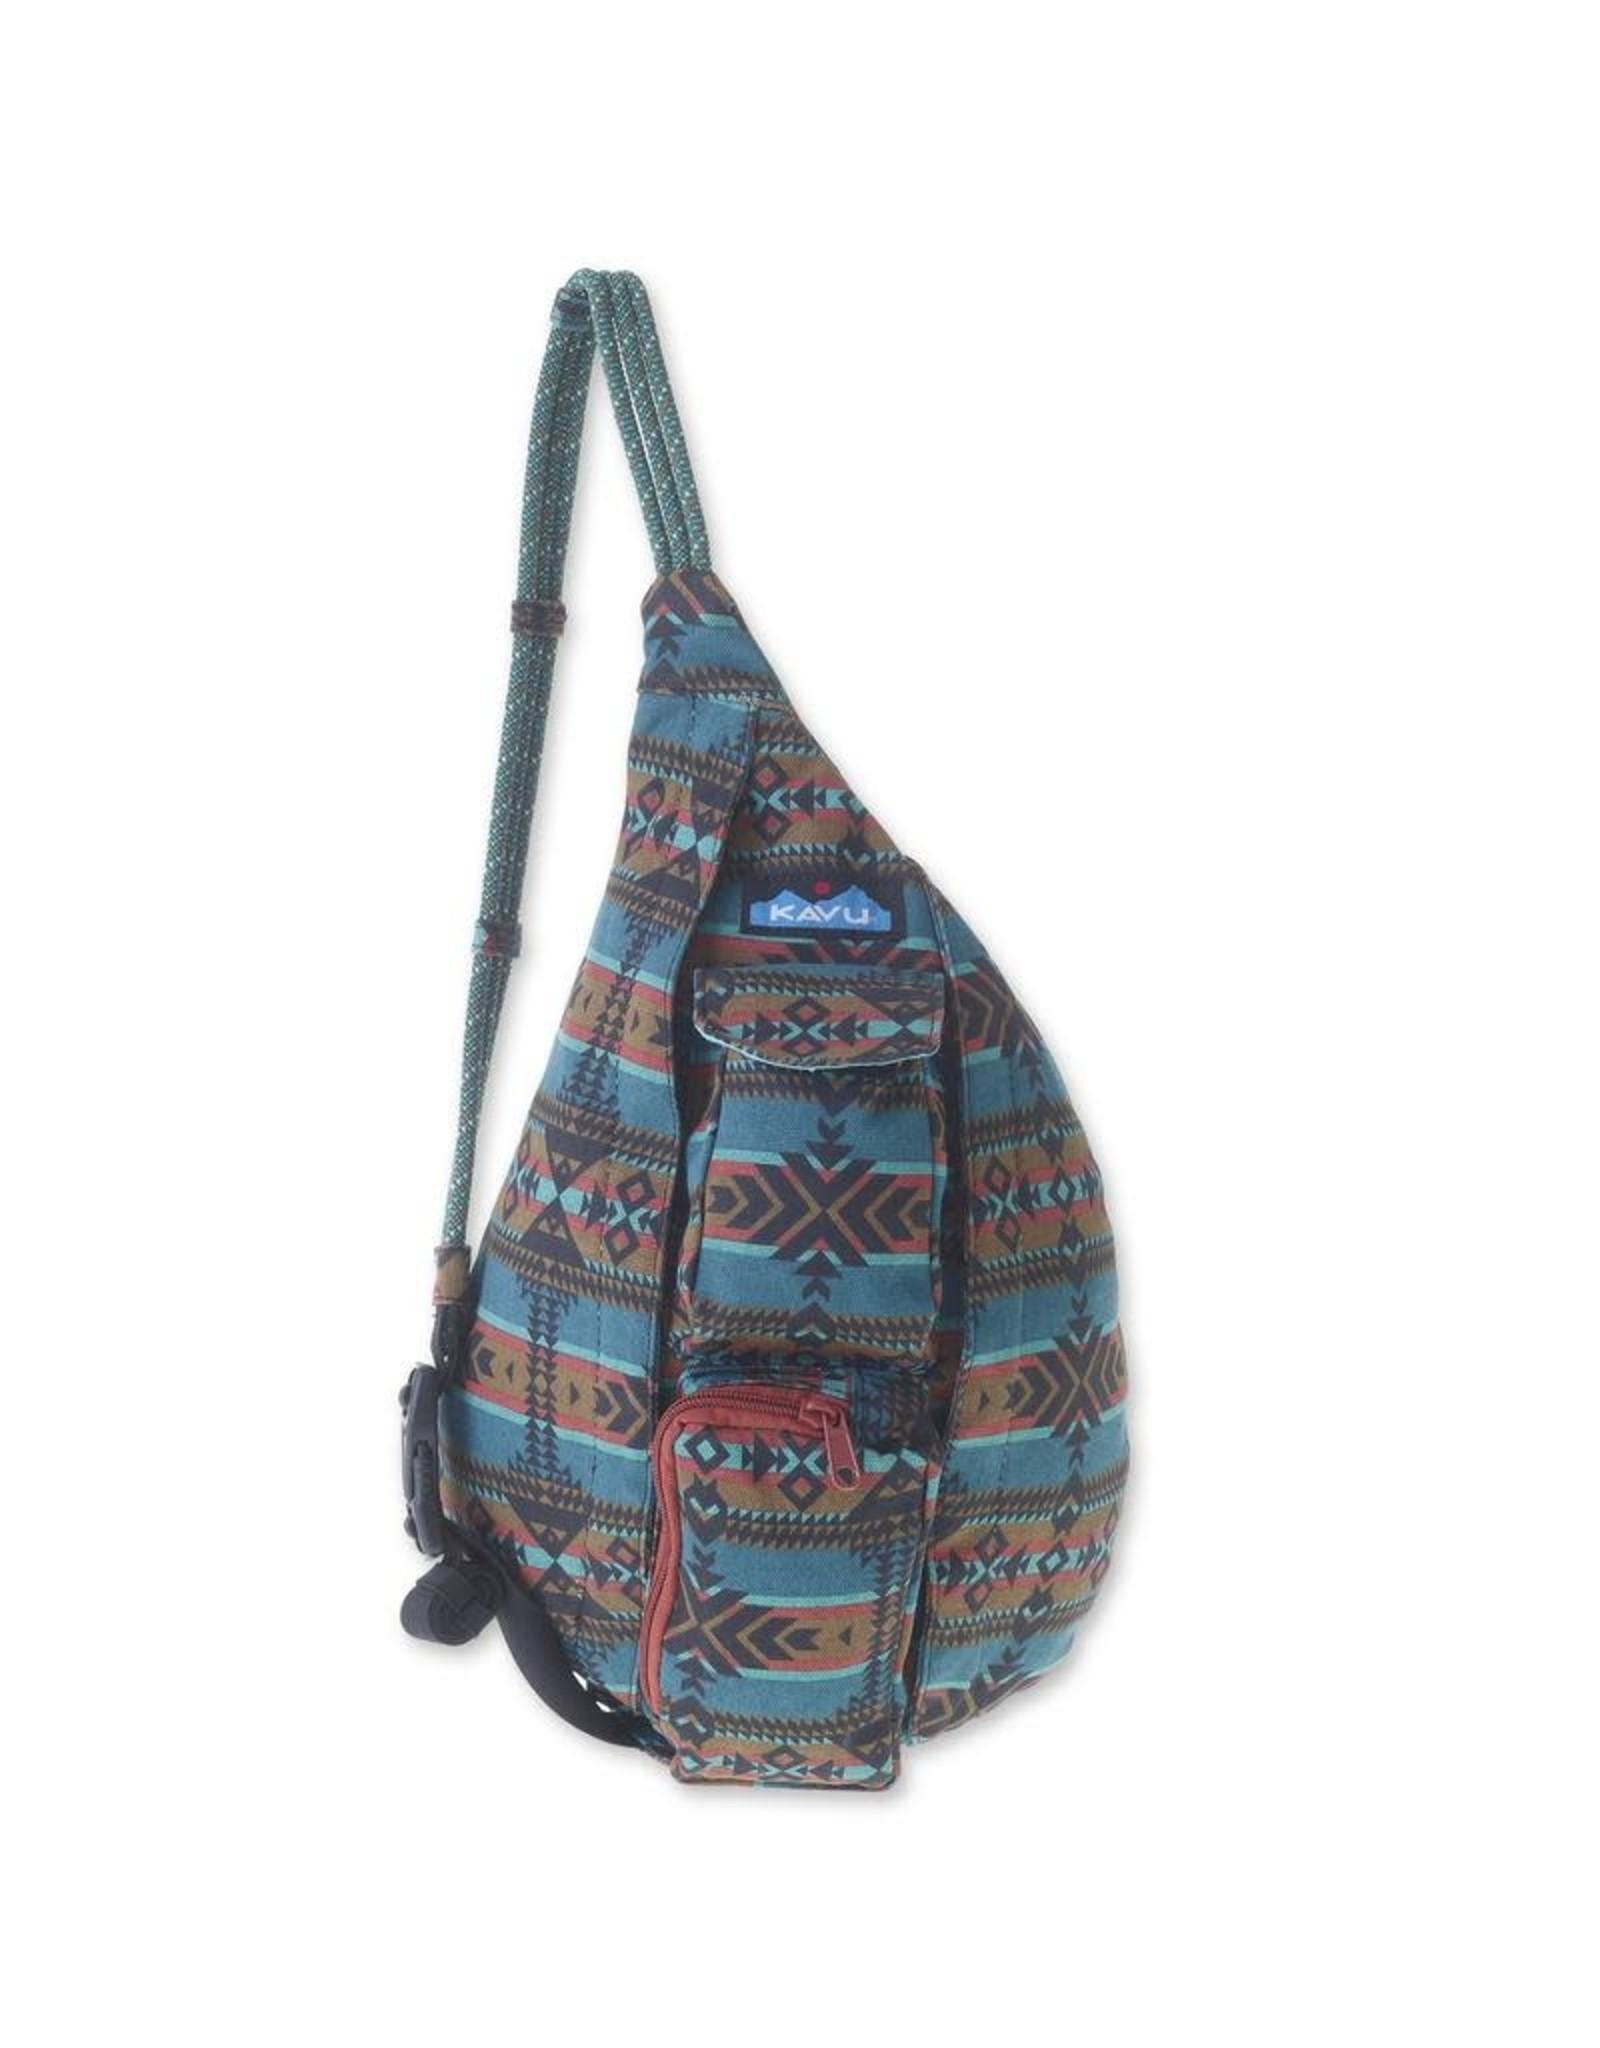 Kavu Kavu Rope Bag - Prints